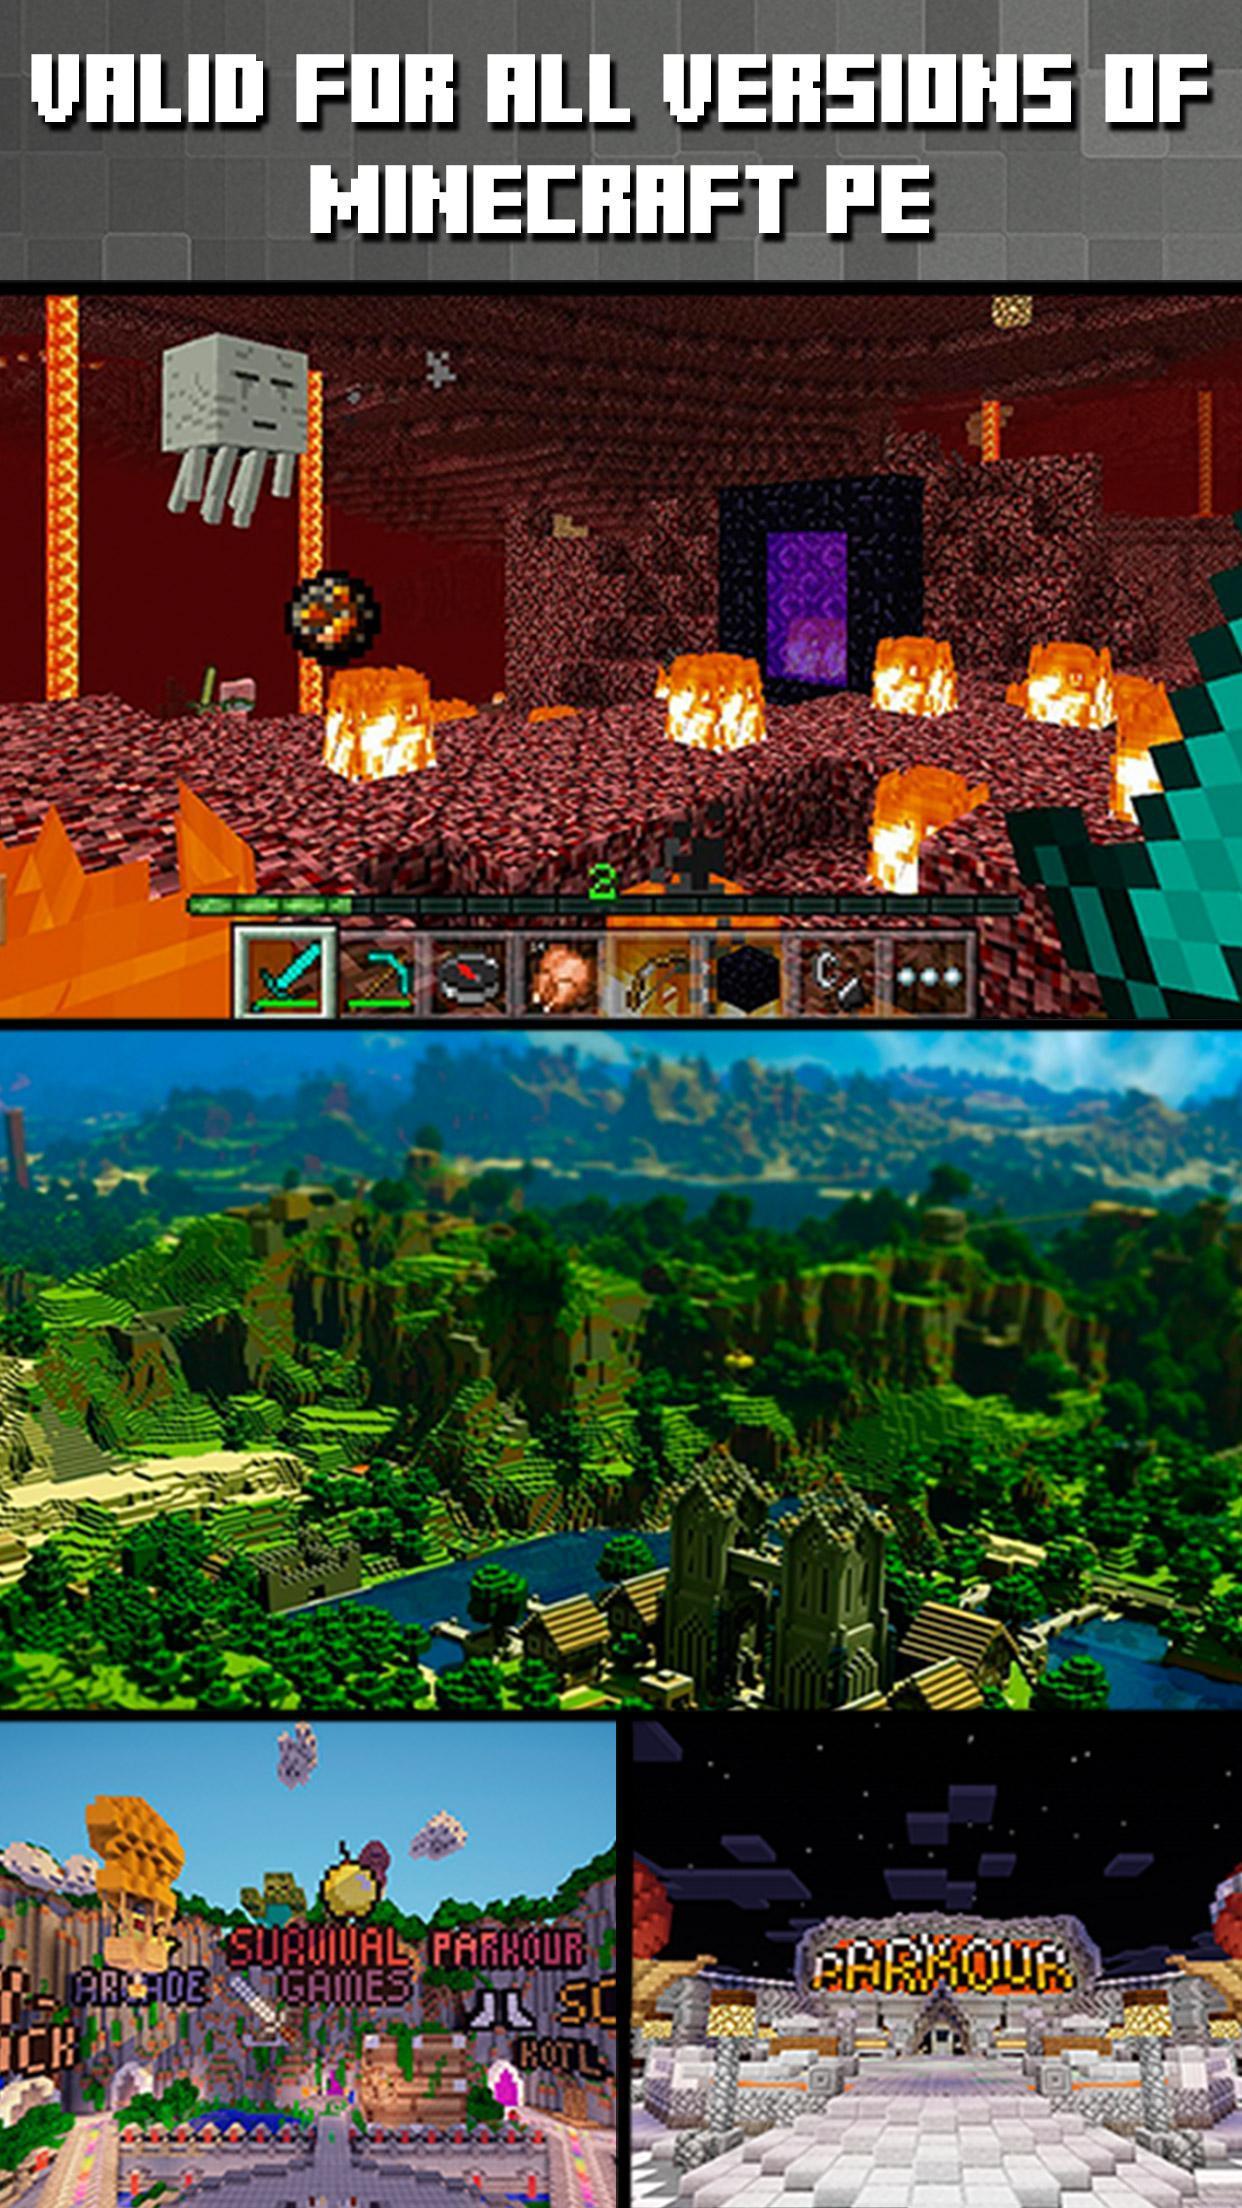 Servers for Minecraft PE 2.16 Screenshot 2